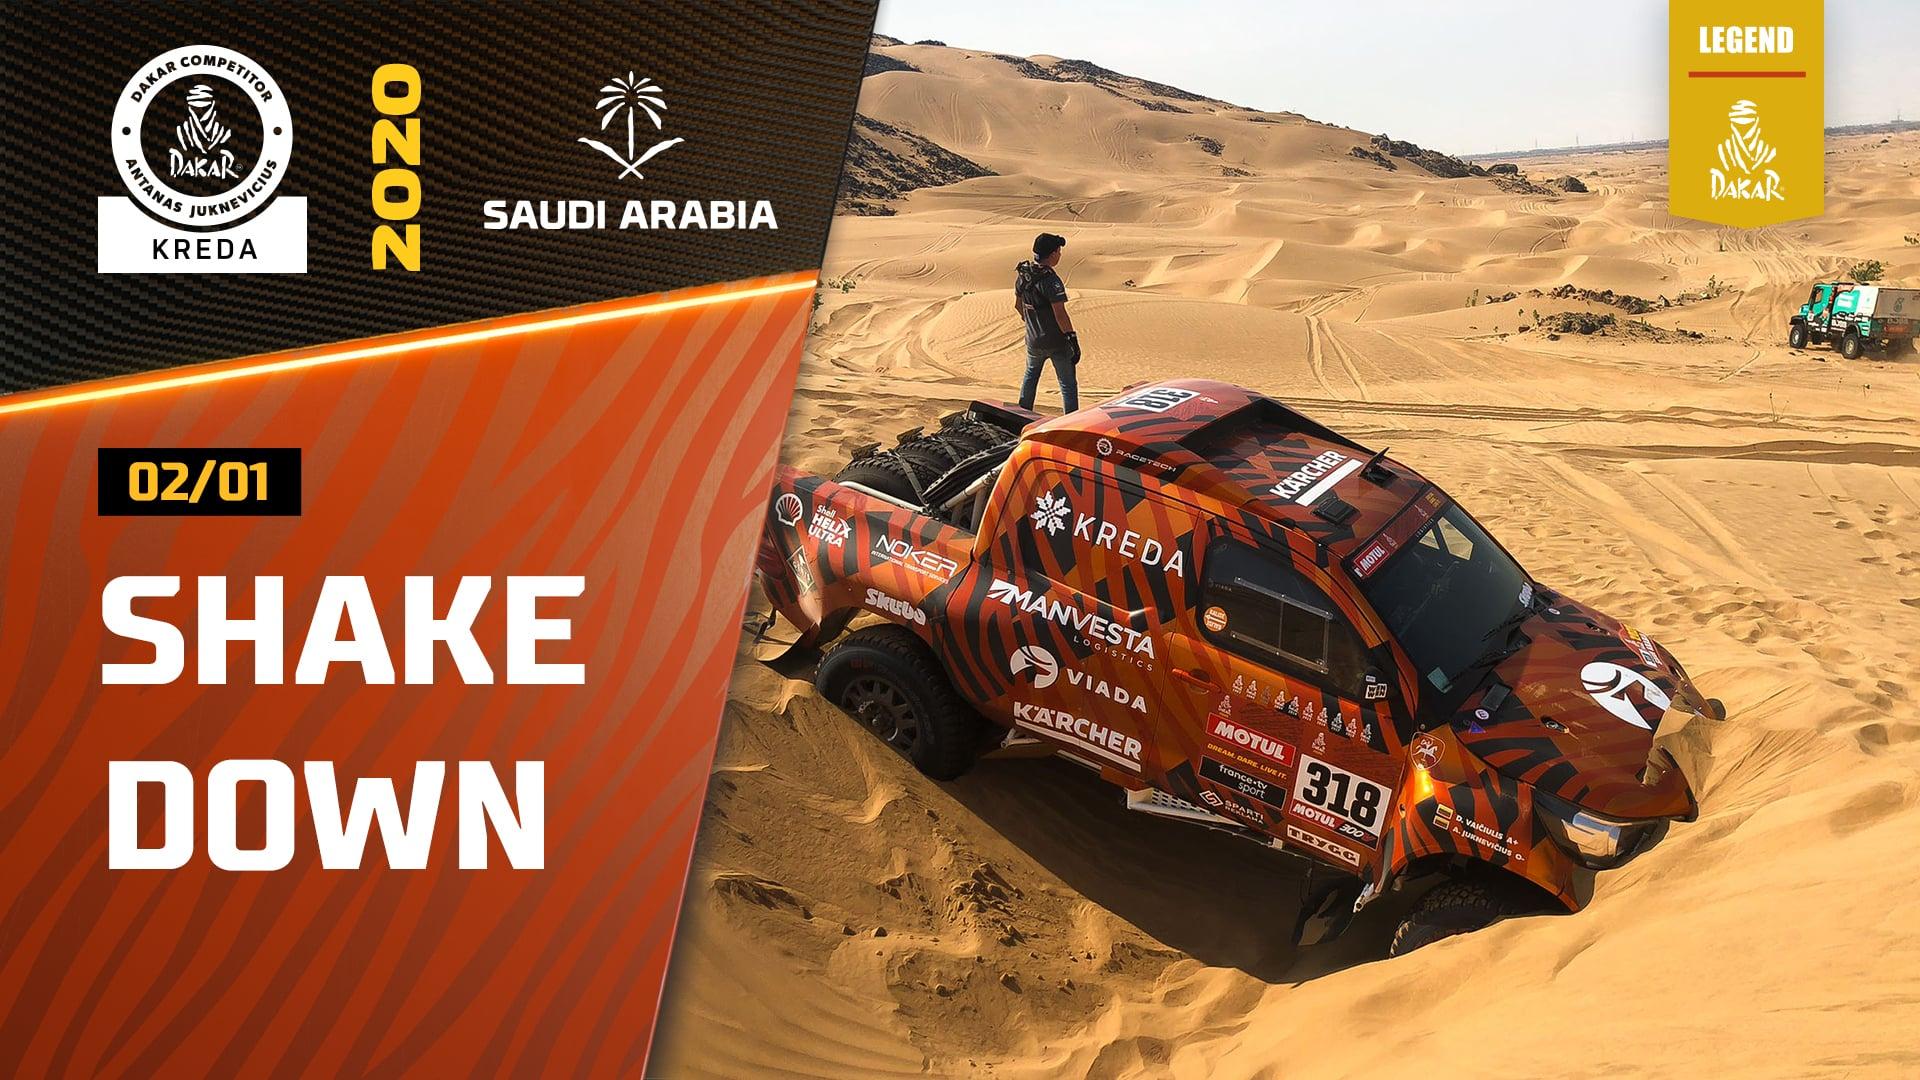 Dakar Rally 2020. Shakedown Session & Friendly Race with KAMAZ Before Dakar Rally Start